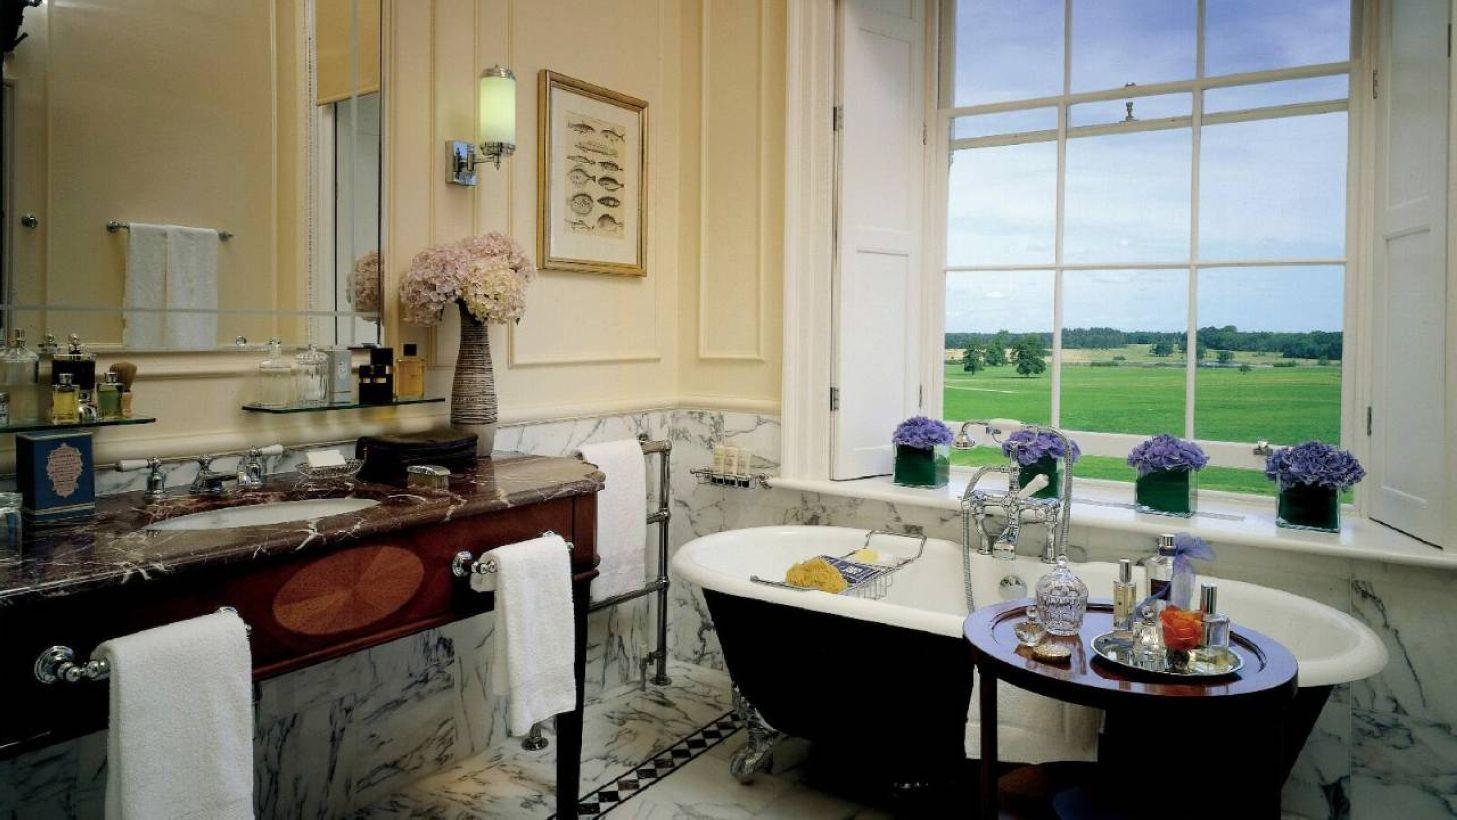 33 Gorgeous Bathroom Design Ideas Looks Likes 5 Star Hotel